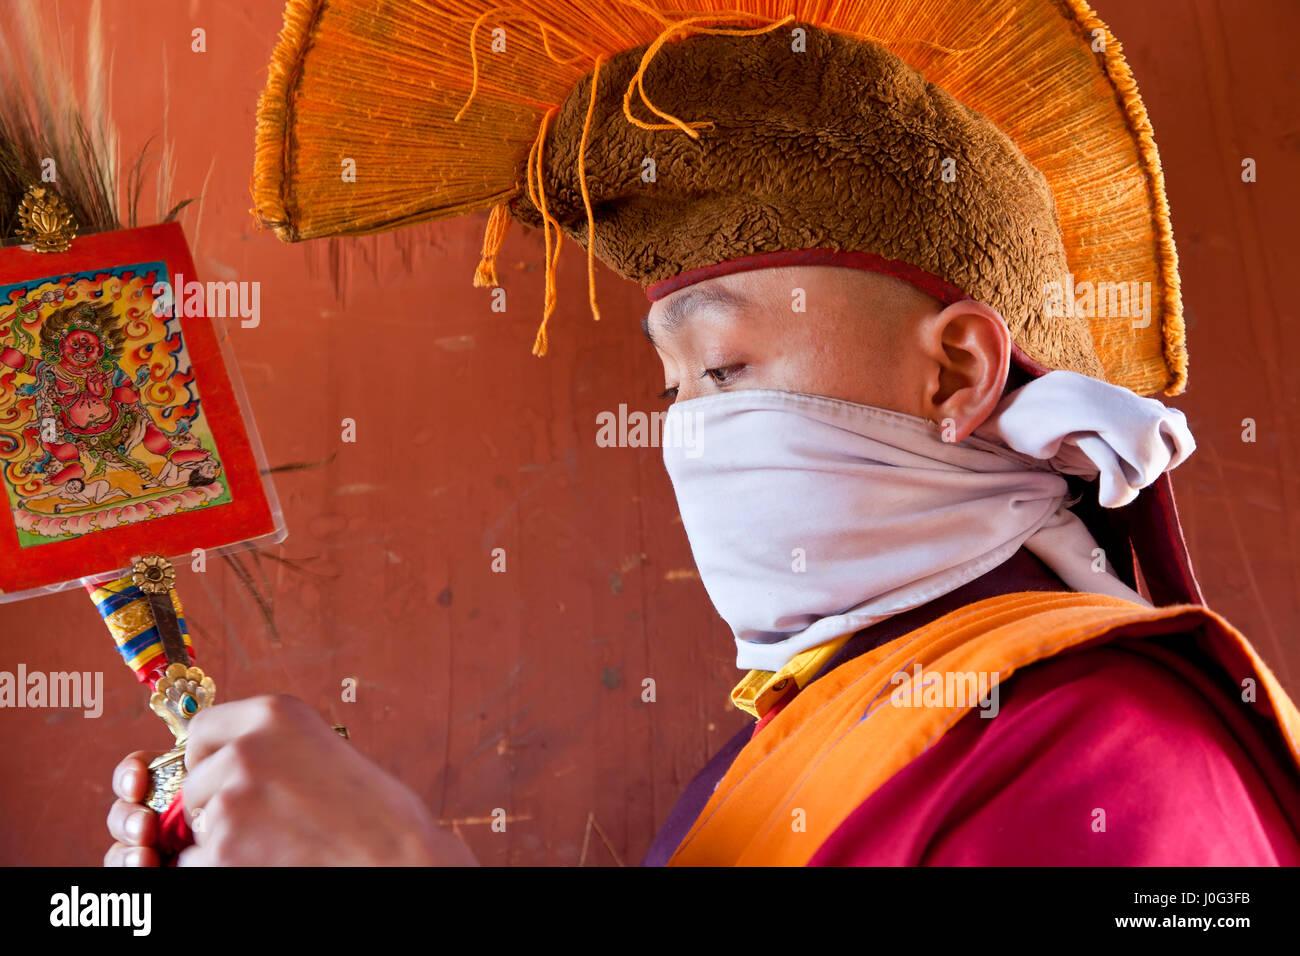 Monje, Tamshing Phala Chhoupa festival, Monasterio Tamshing, nr, Bumthang Jakar, Bhután Foto de stock